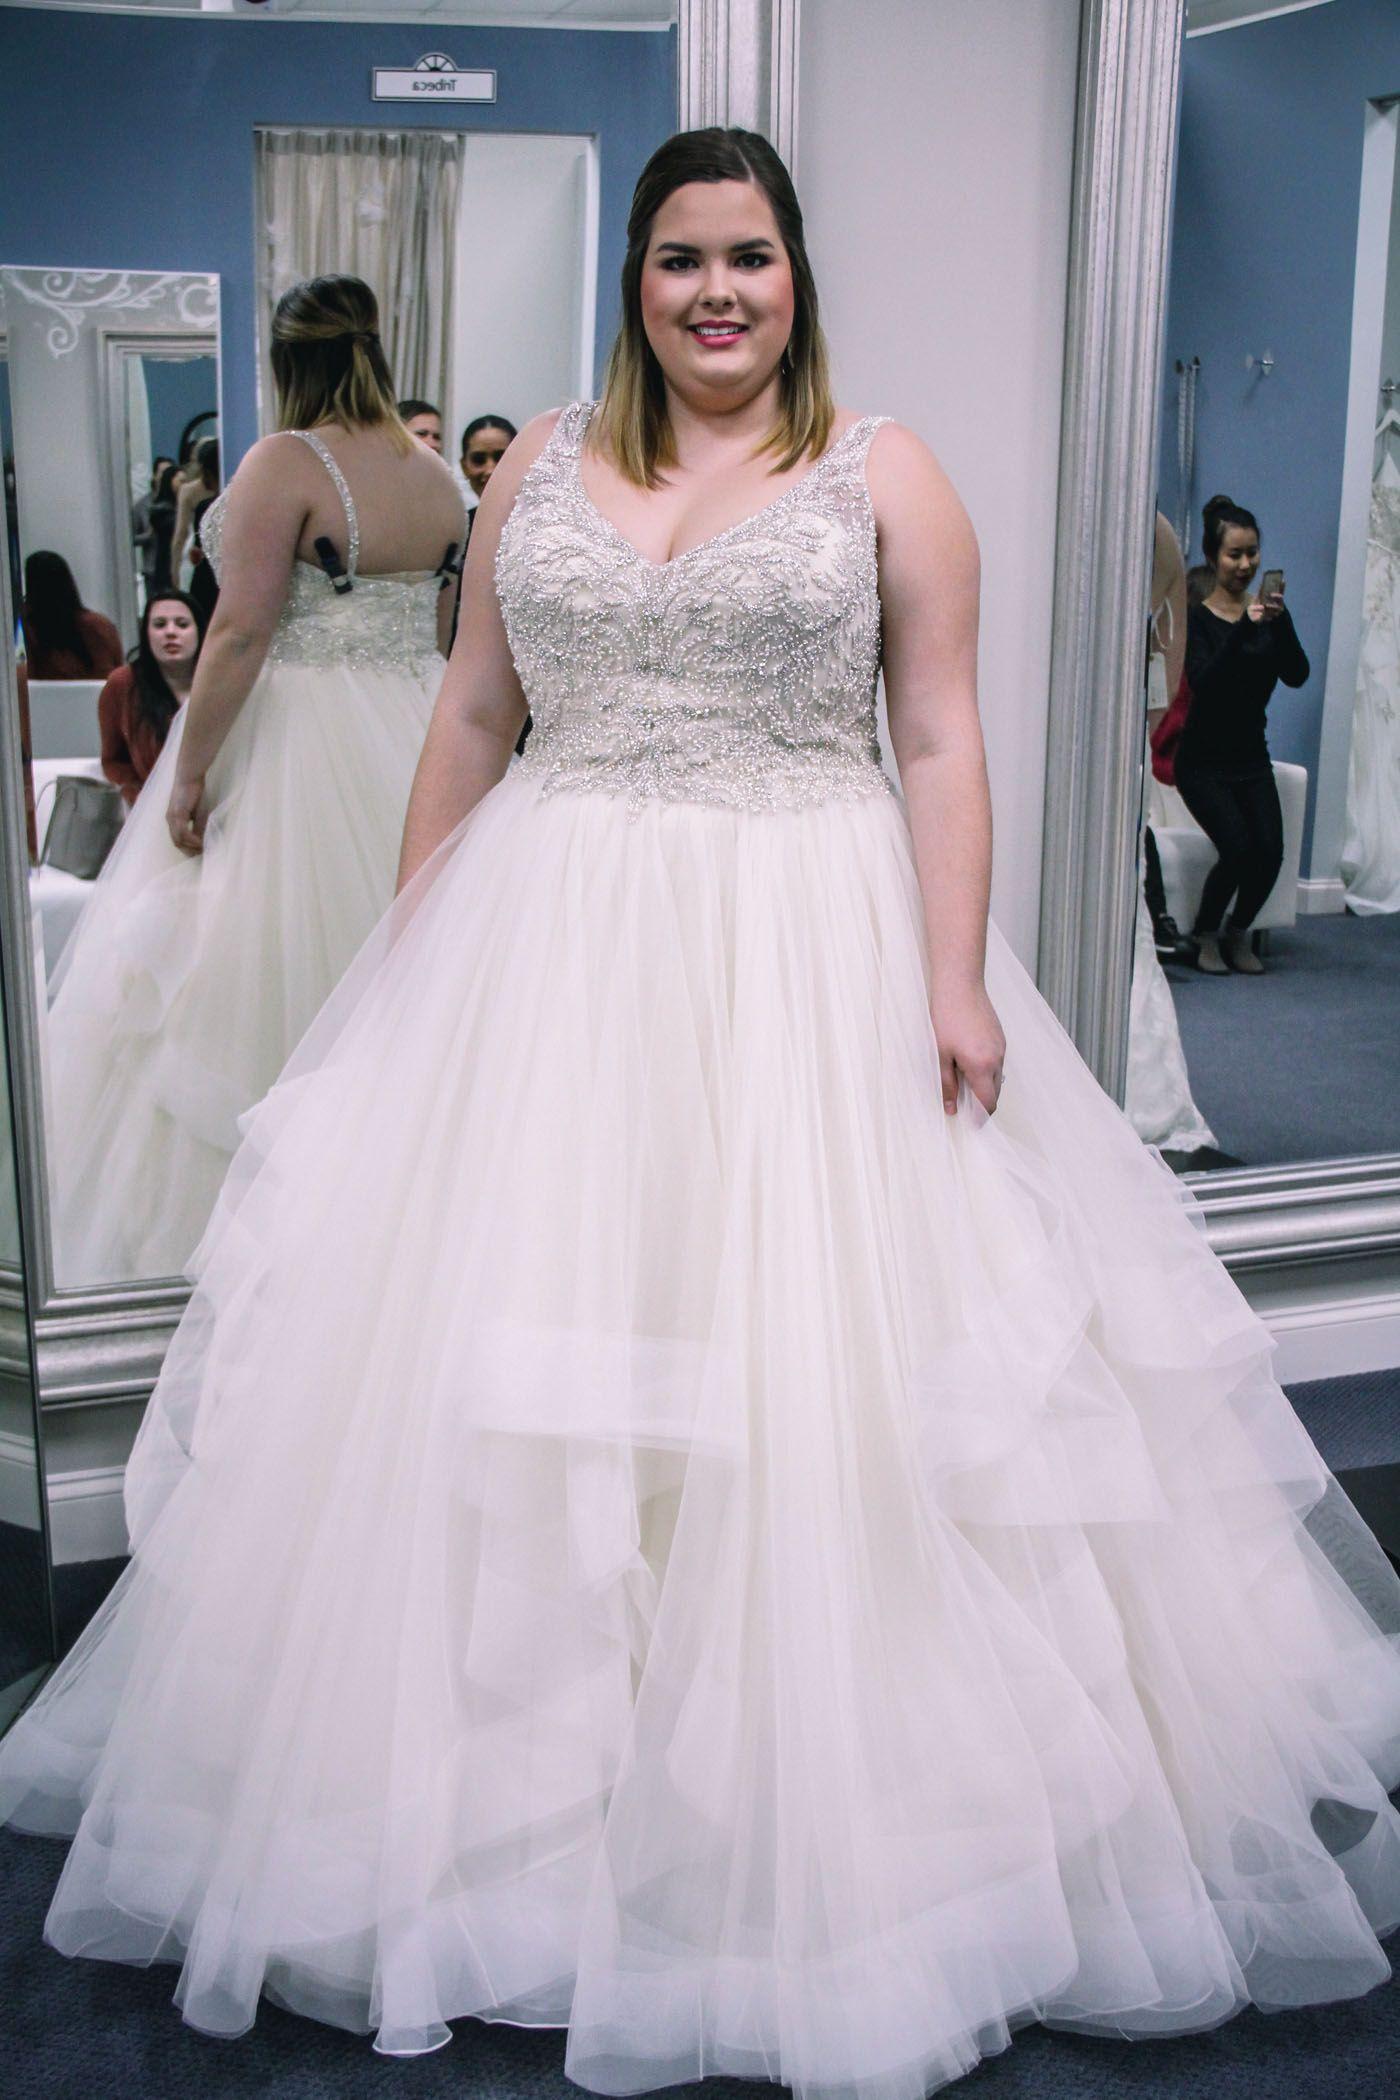 Wedding Dress Shopping | Stylish Sassy & Classy | Wedding dresses ...